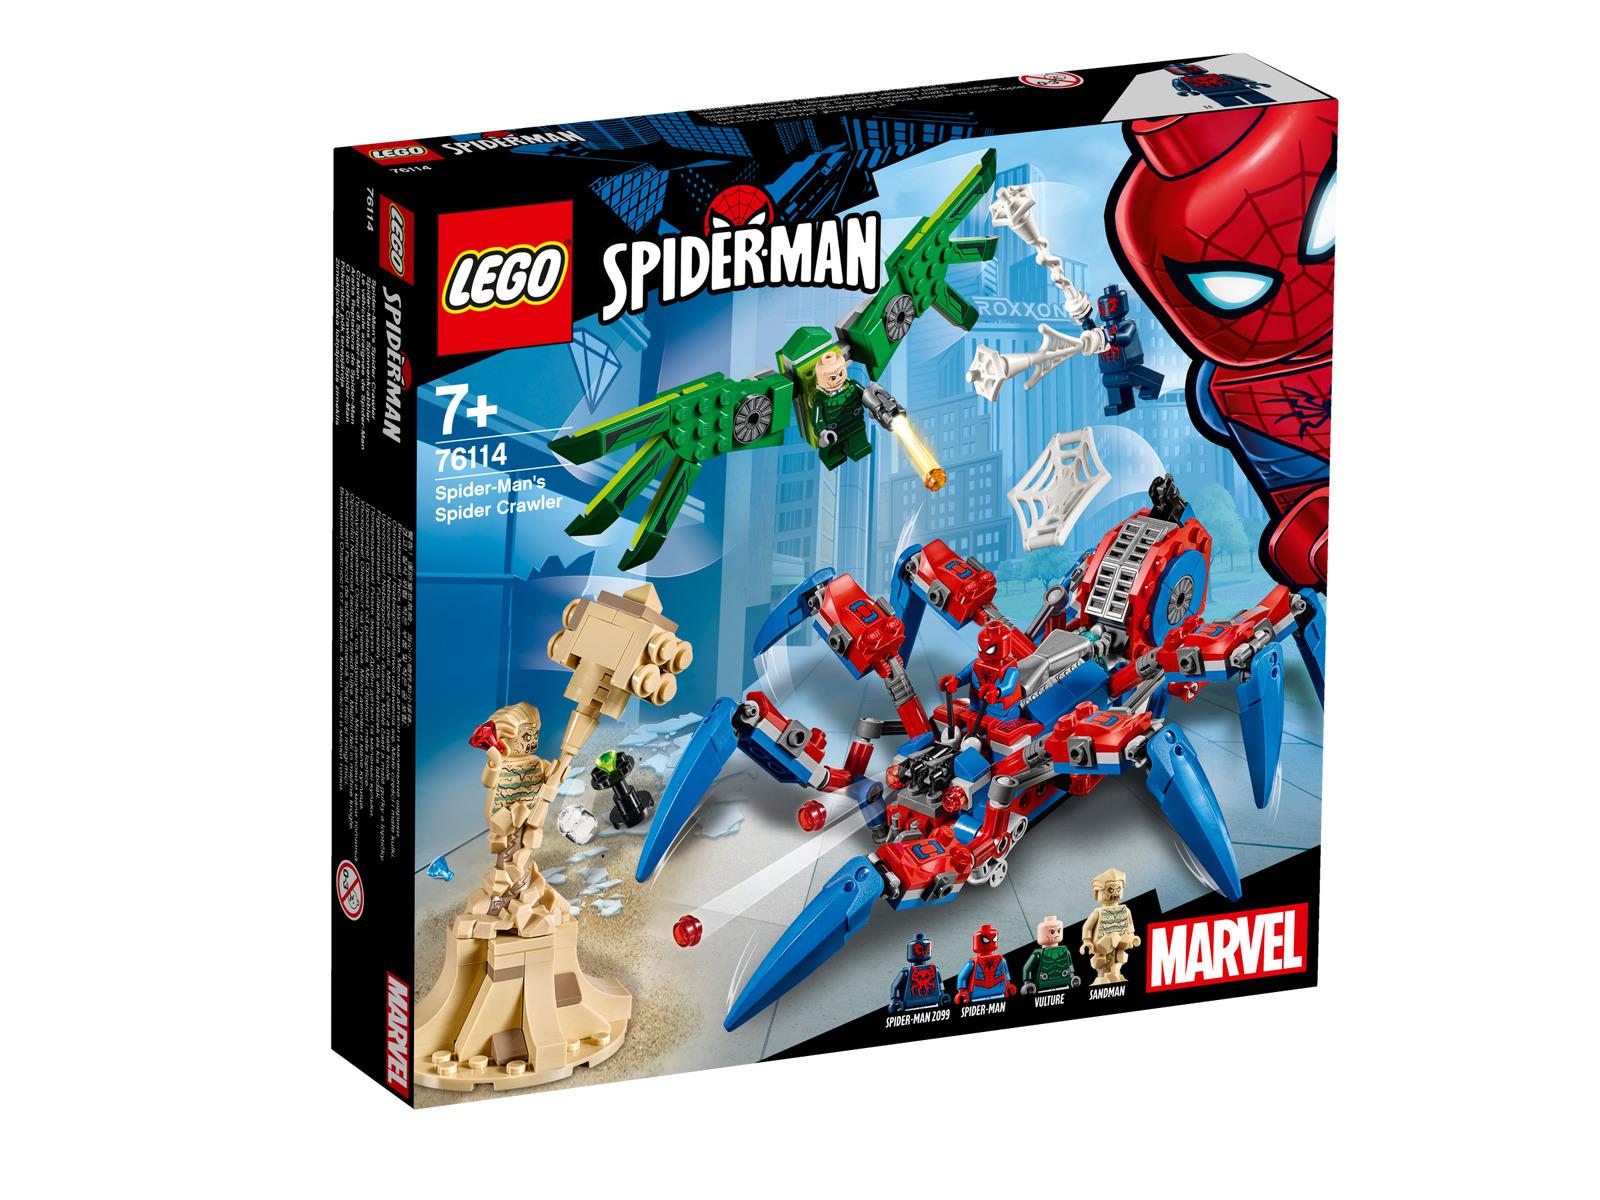 LEGO Marvel Super Heroes Spider-Mans Spinnenkrabbler (76114)